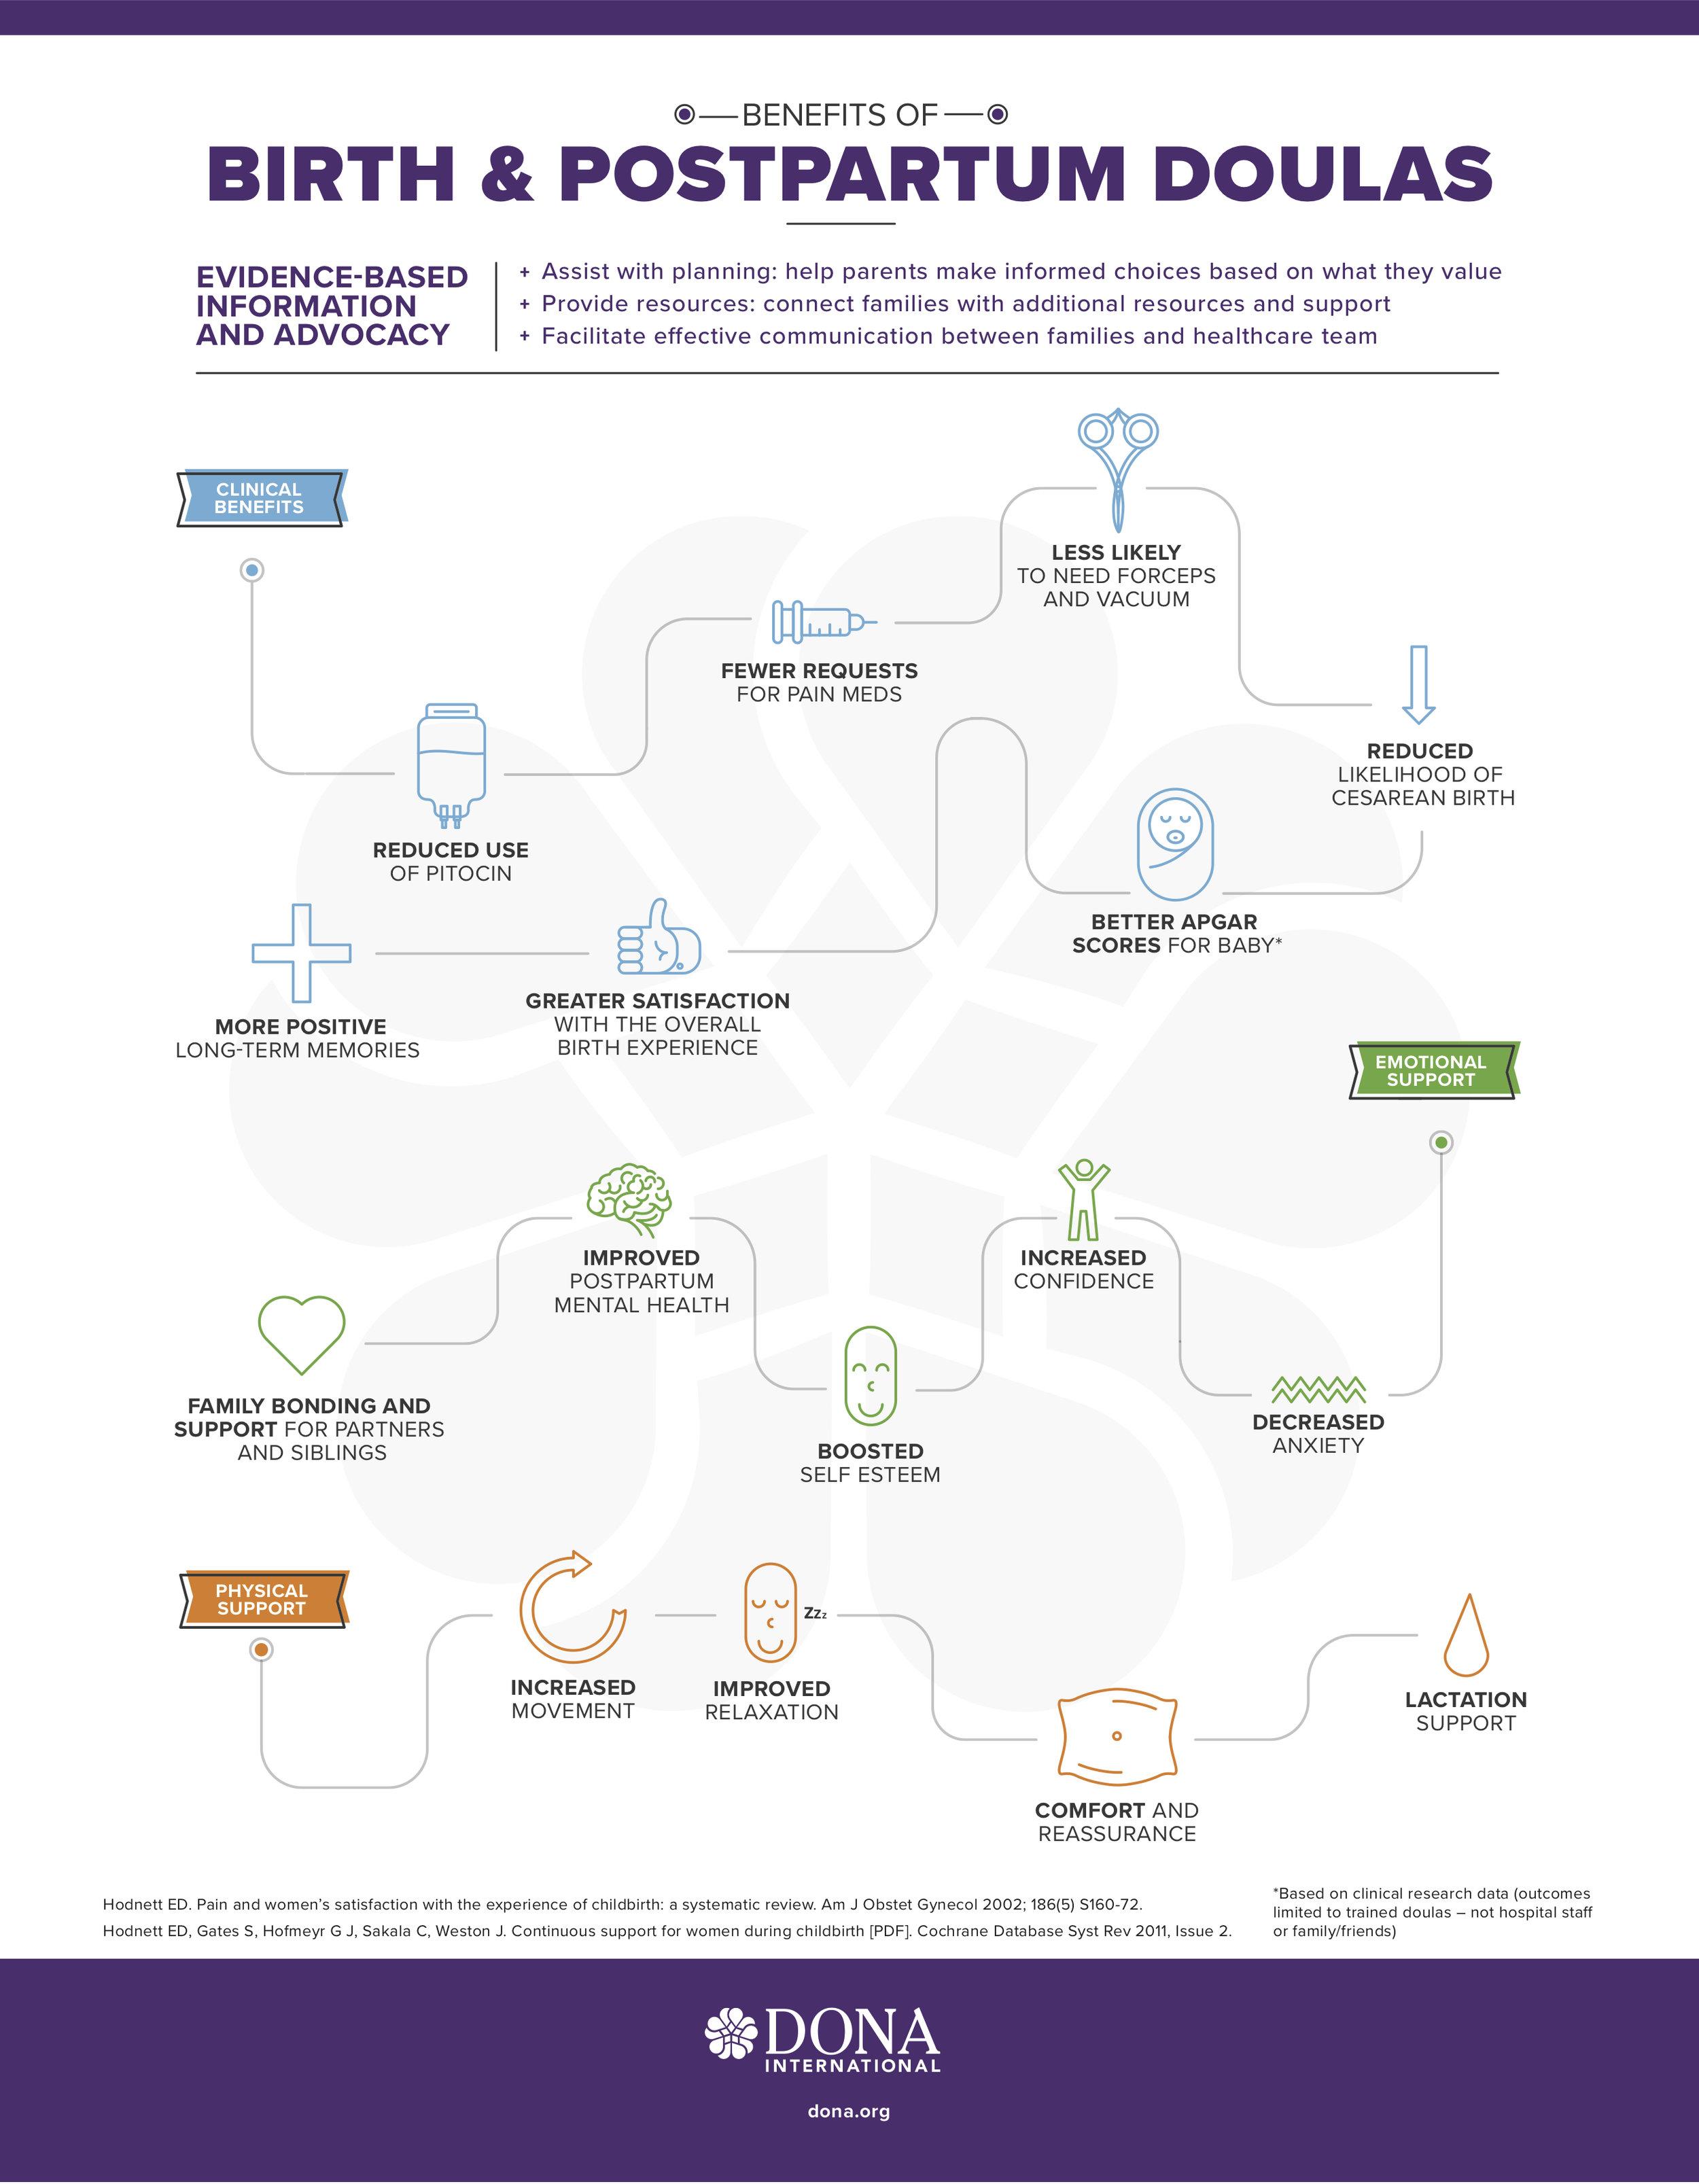 DONA_infographic-3.jpg